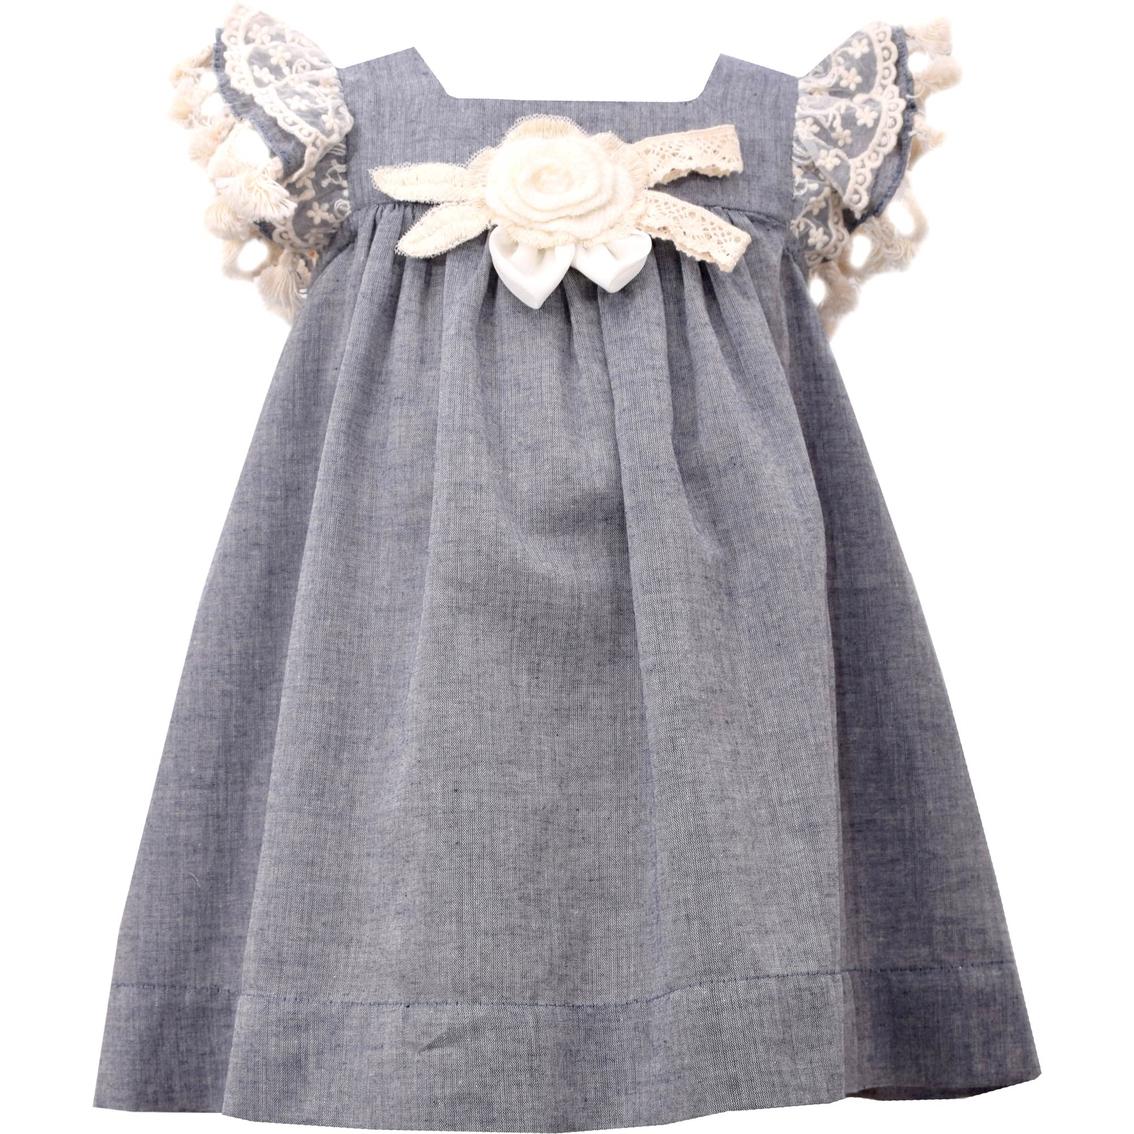 2e7794808 Bonnie Jean Infant Girls Chambray Float Dress Set | Girls' Apparel ...